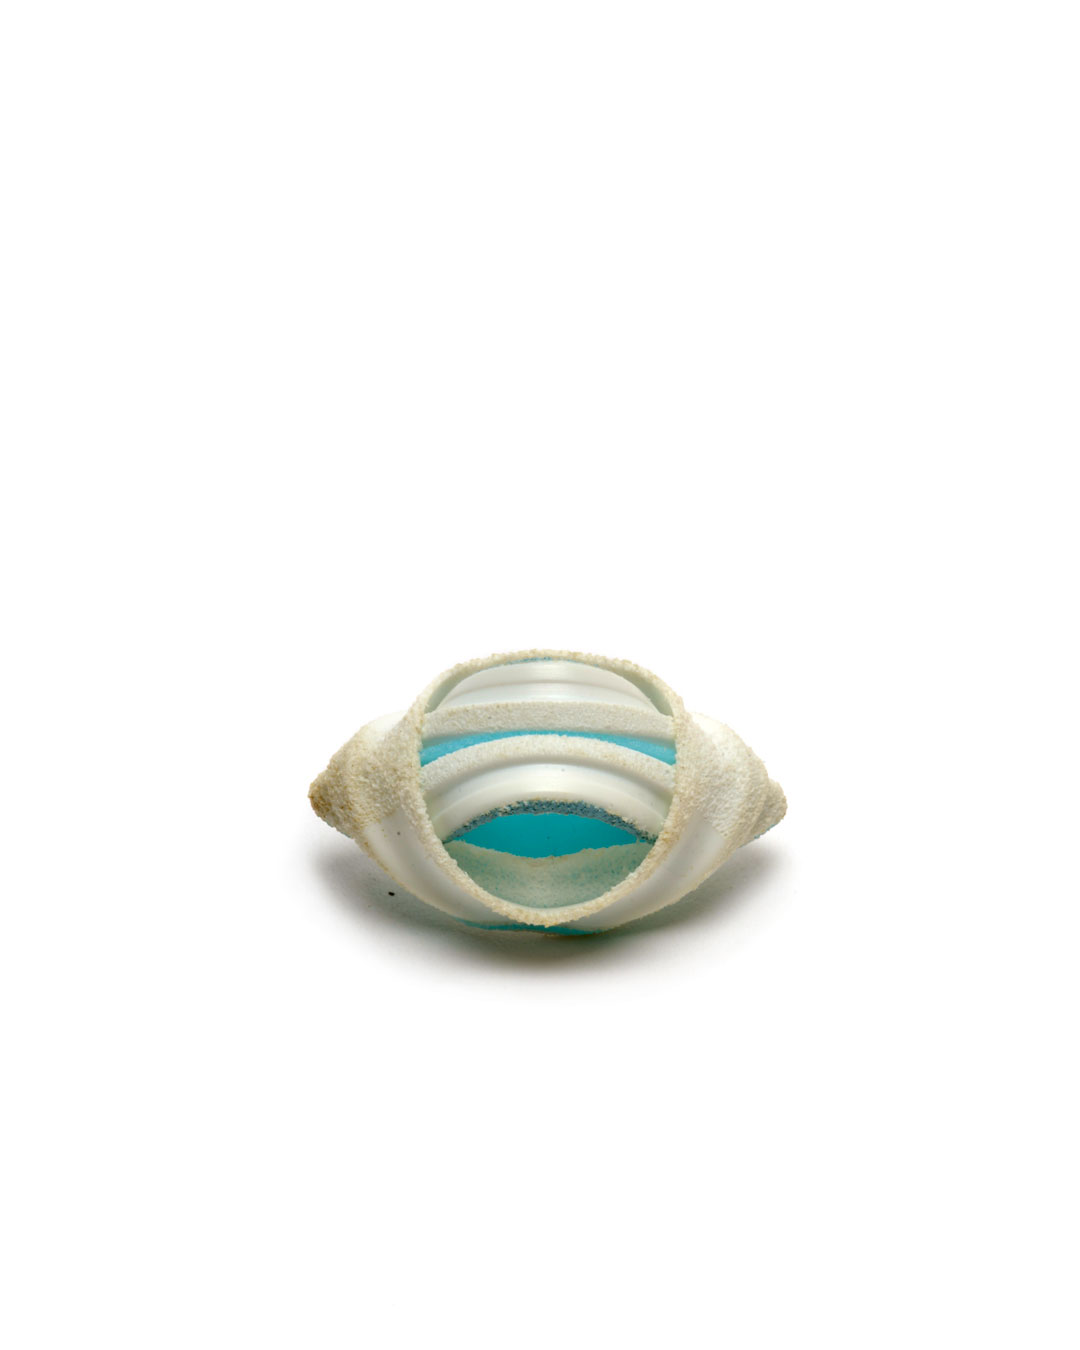 Ute Eitzenhöfer, Alcadef 2, 2002, brooch; plastic (from packaging), silver, 45 x 30 x 20 mm, €1250